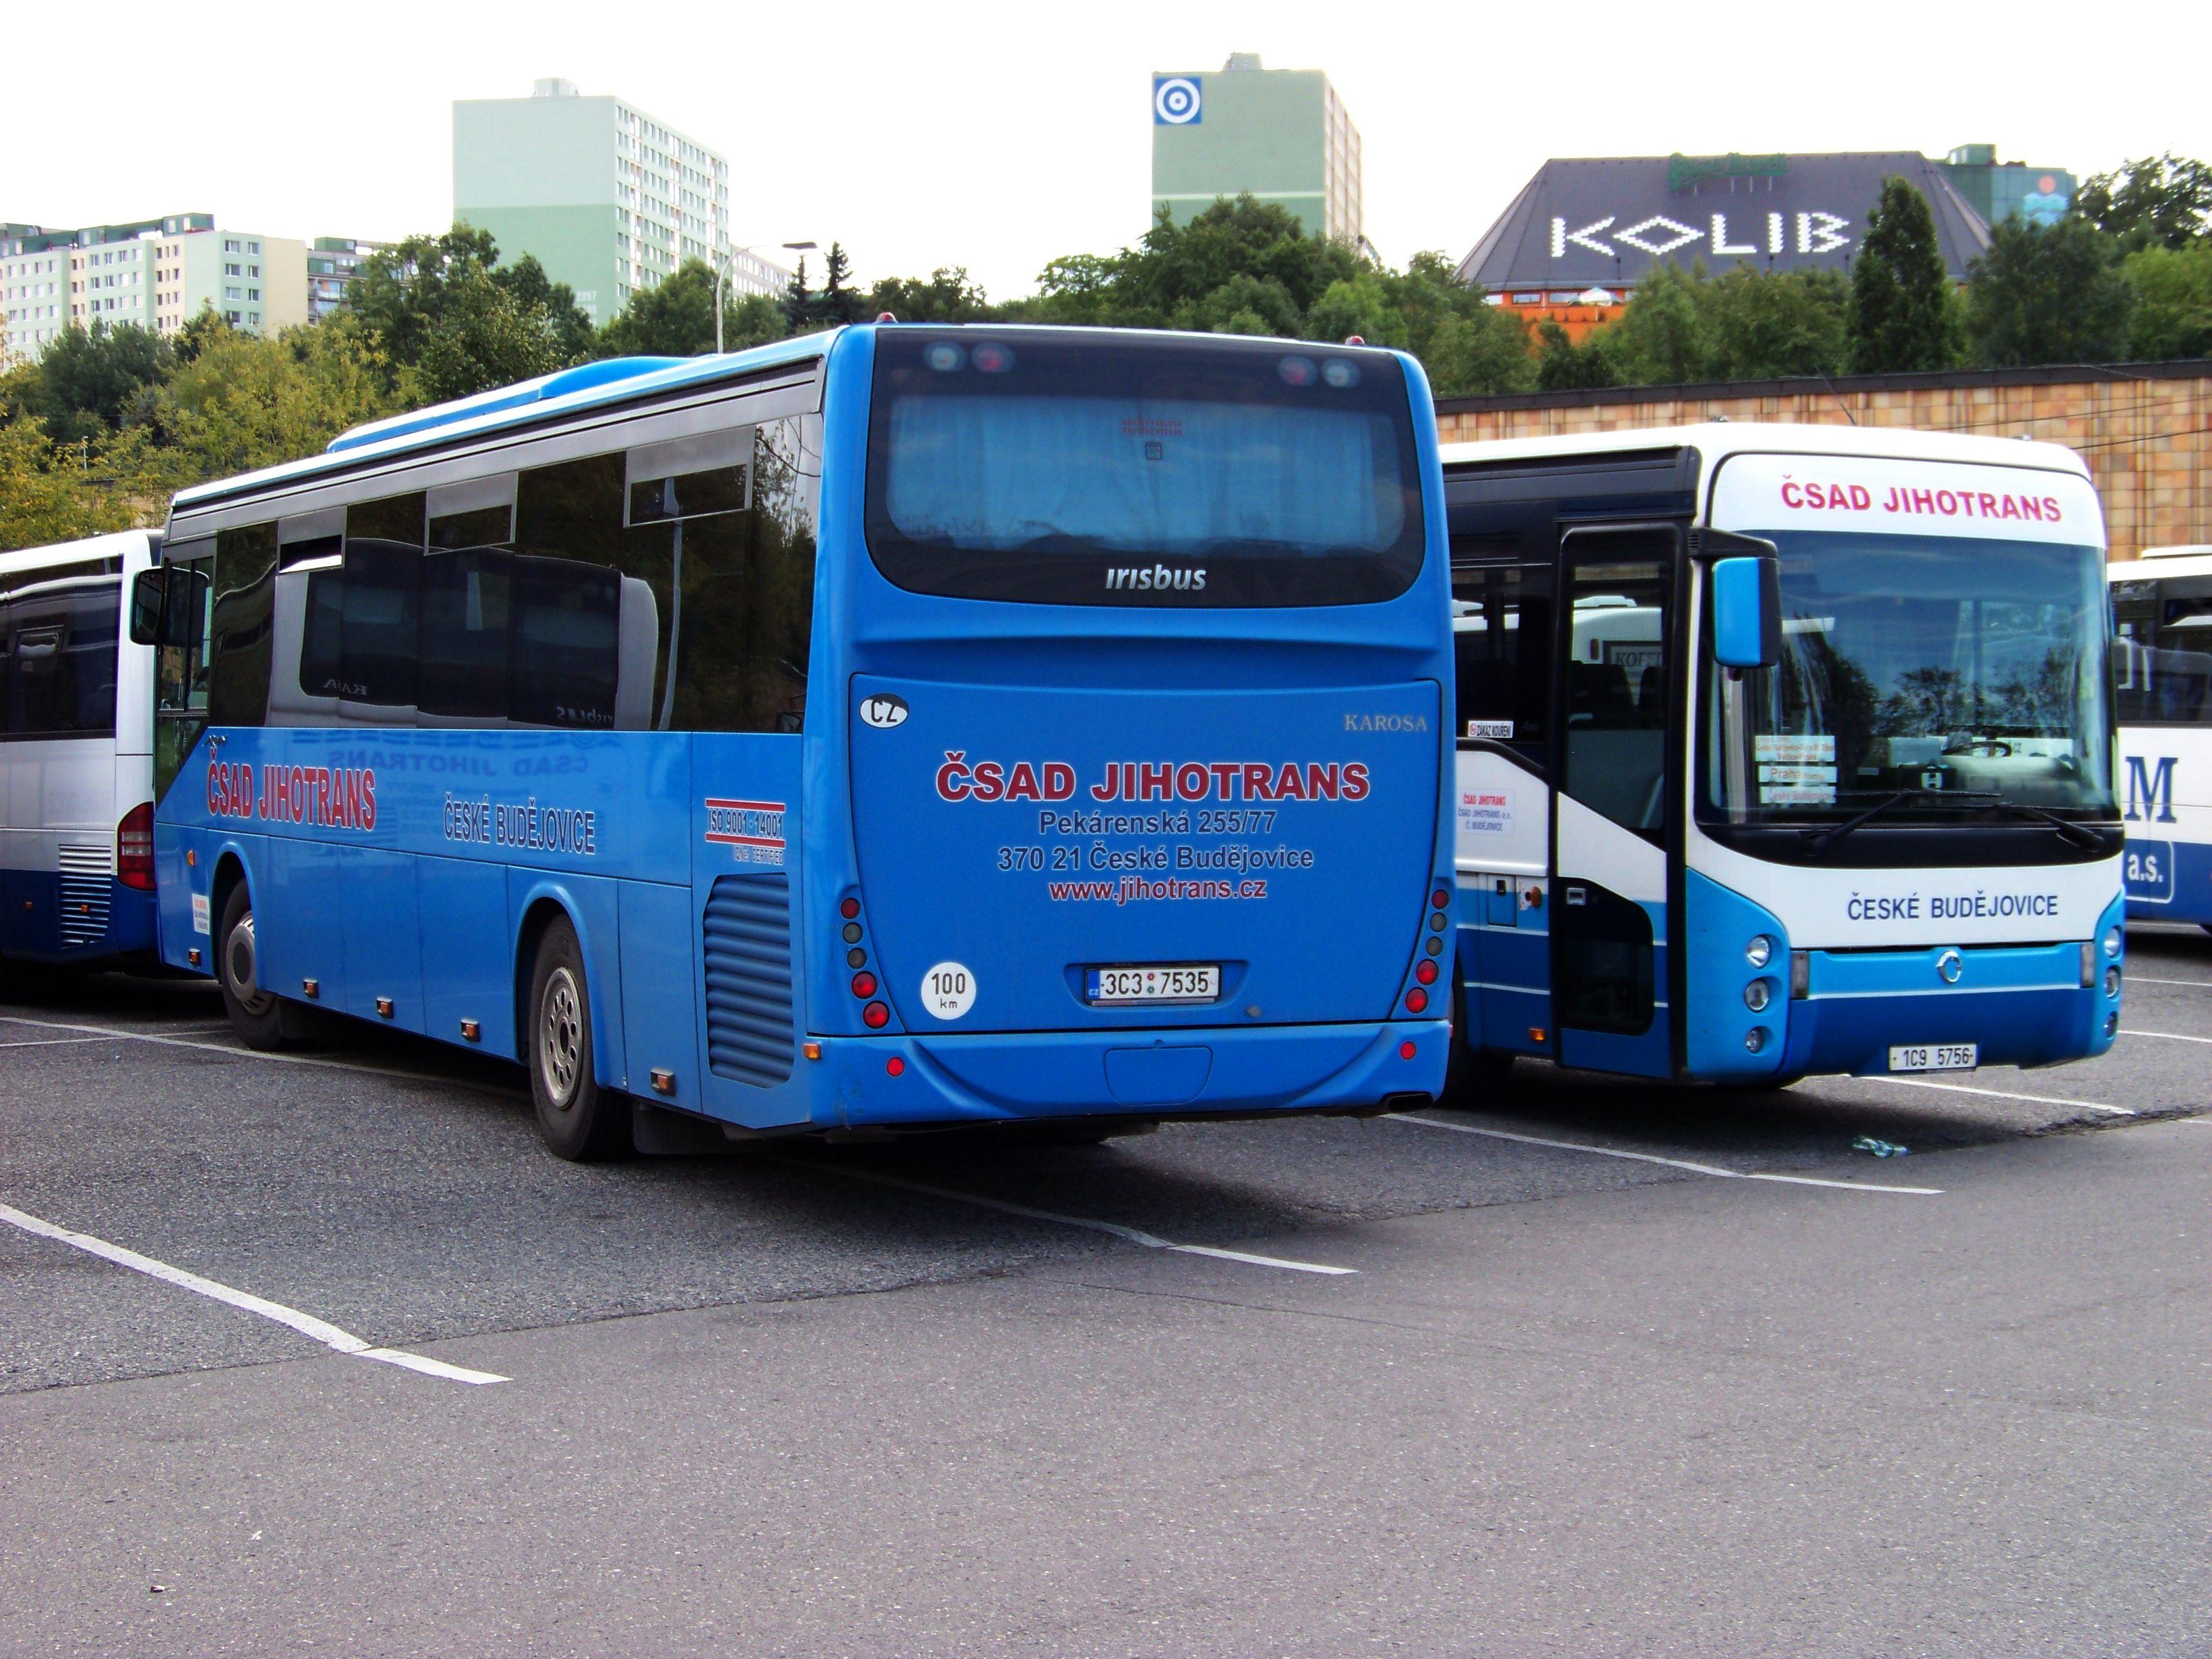 File:Roztyly, autobusy Irisbusy ČSAD Jihotrans jpg